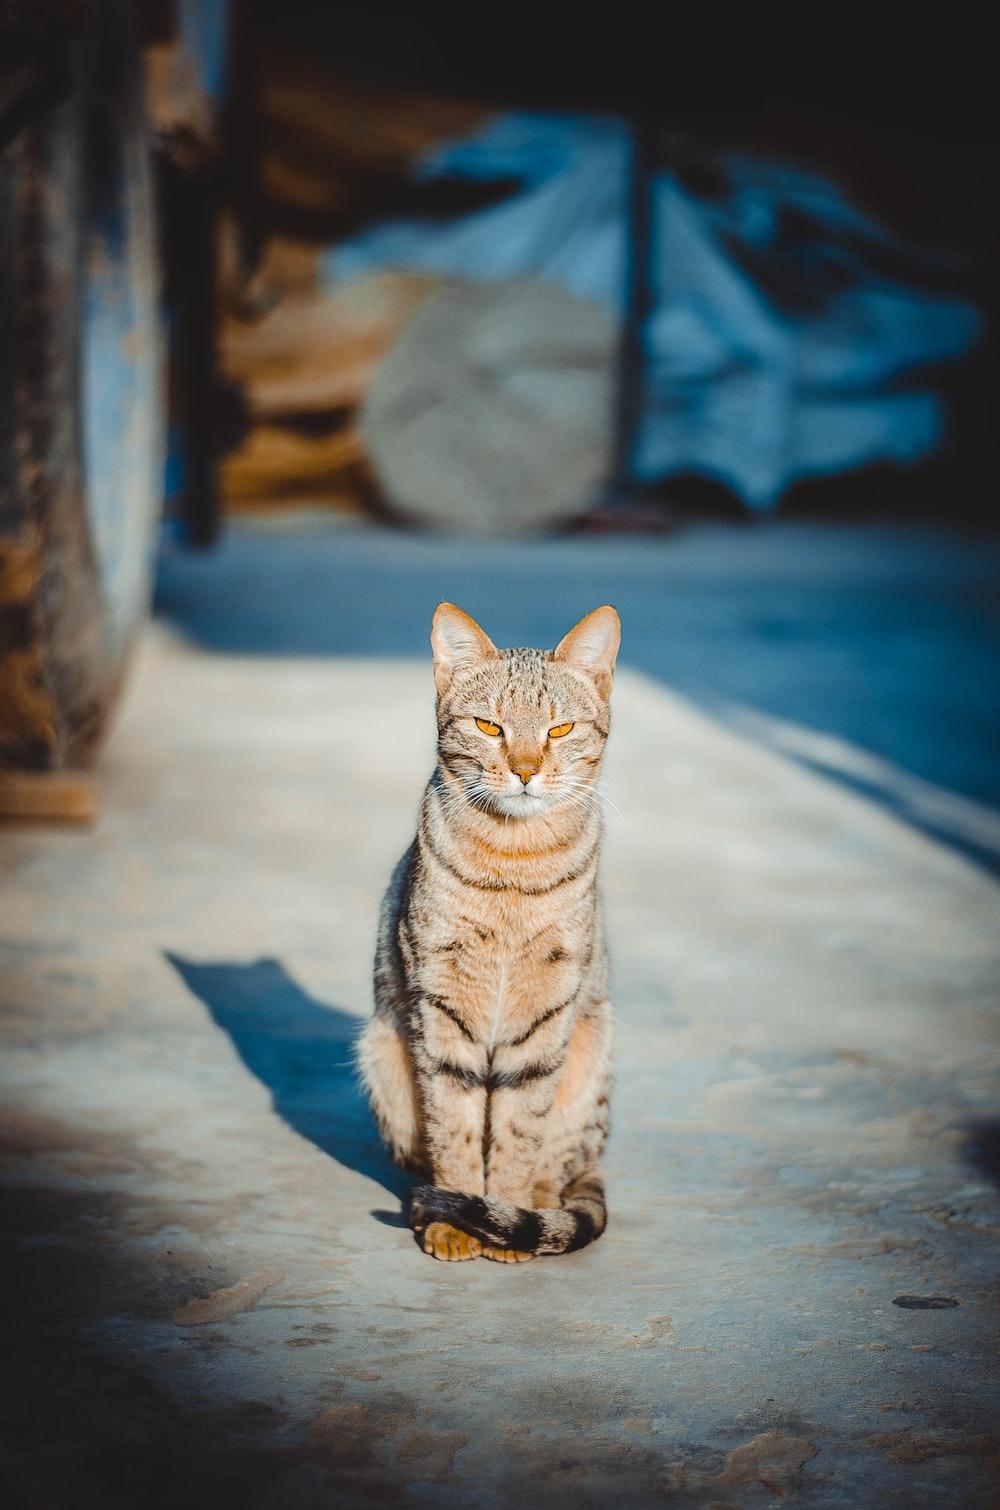 cat on pavement